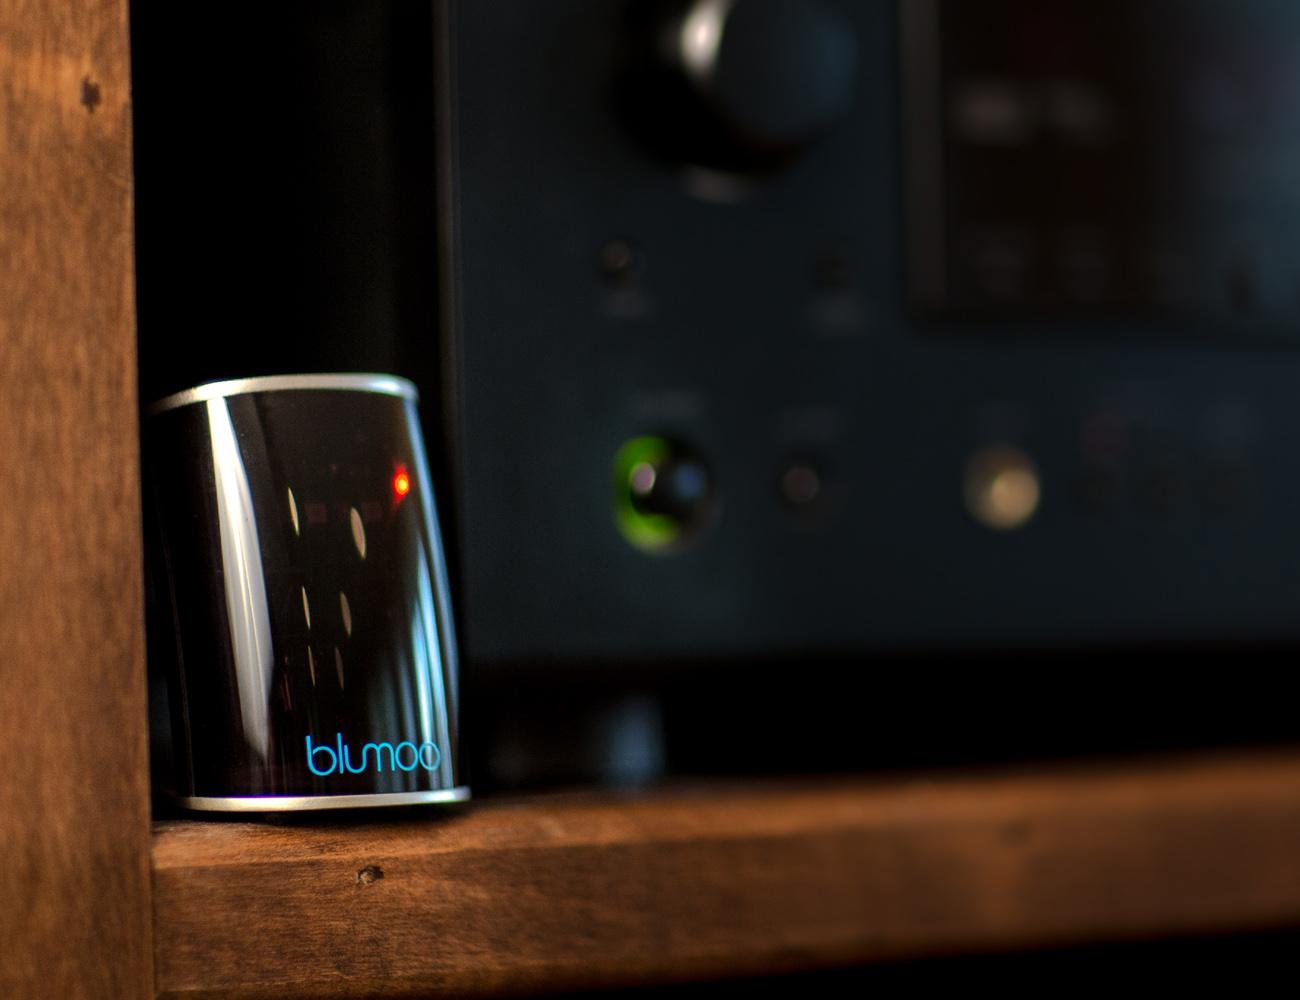 Blumoo Smart Universal Remote